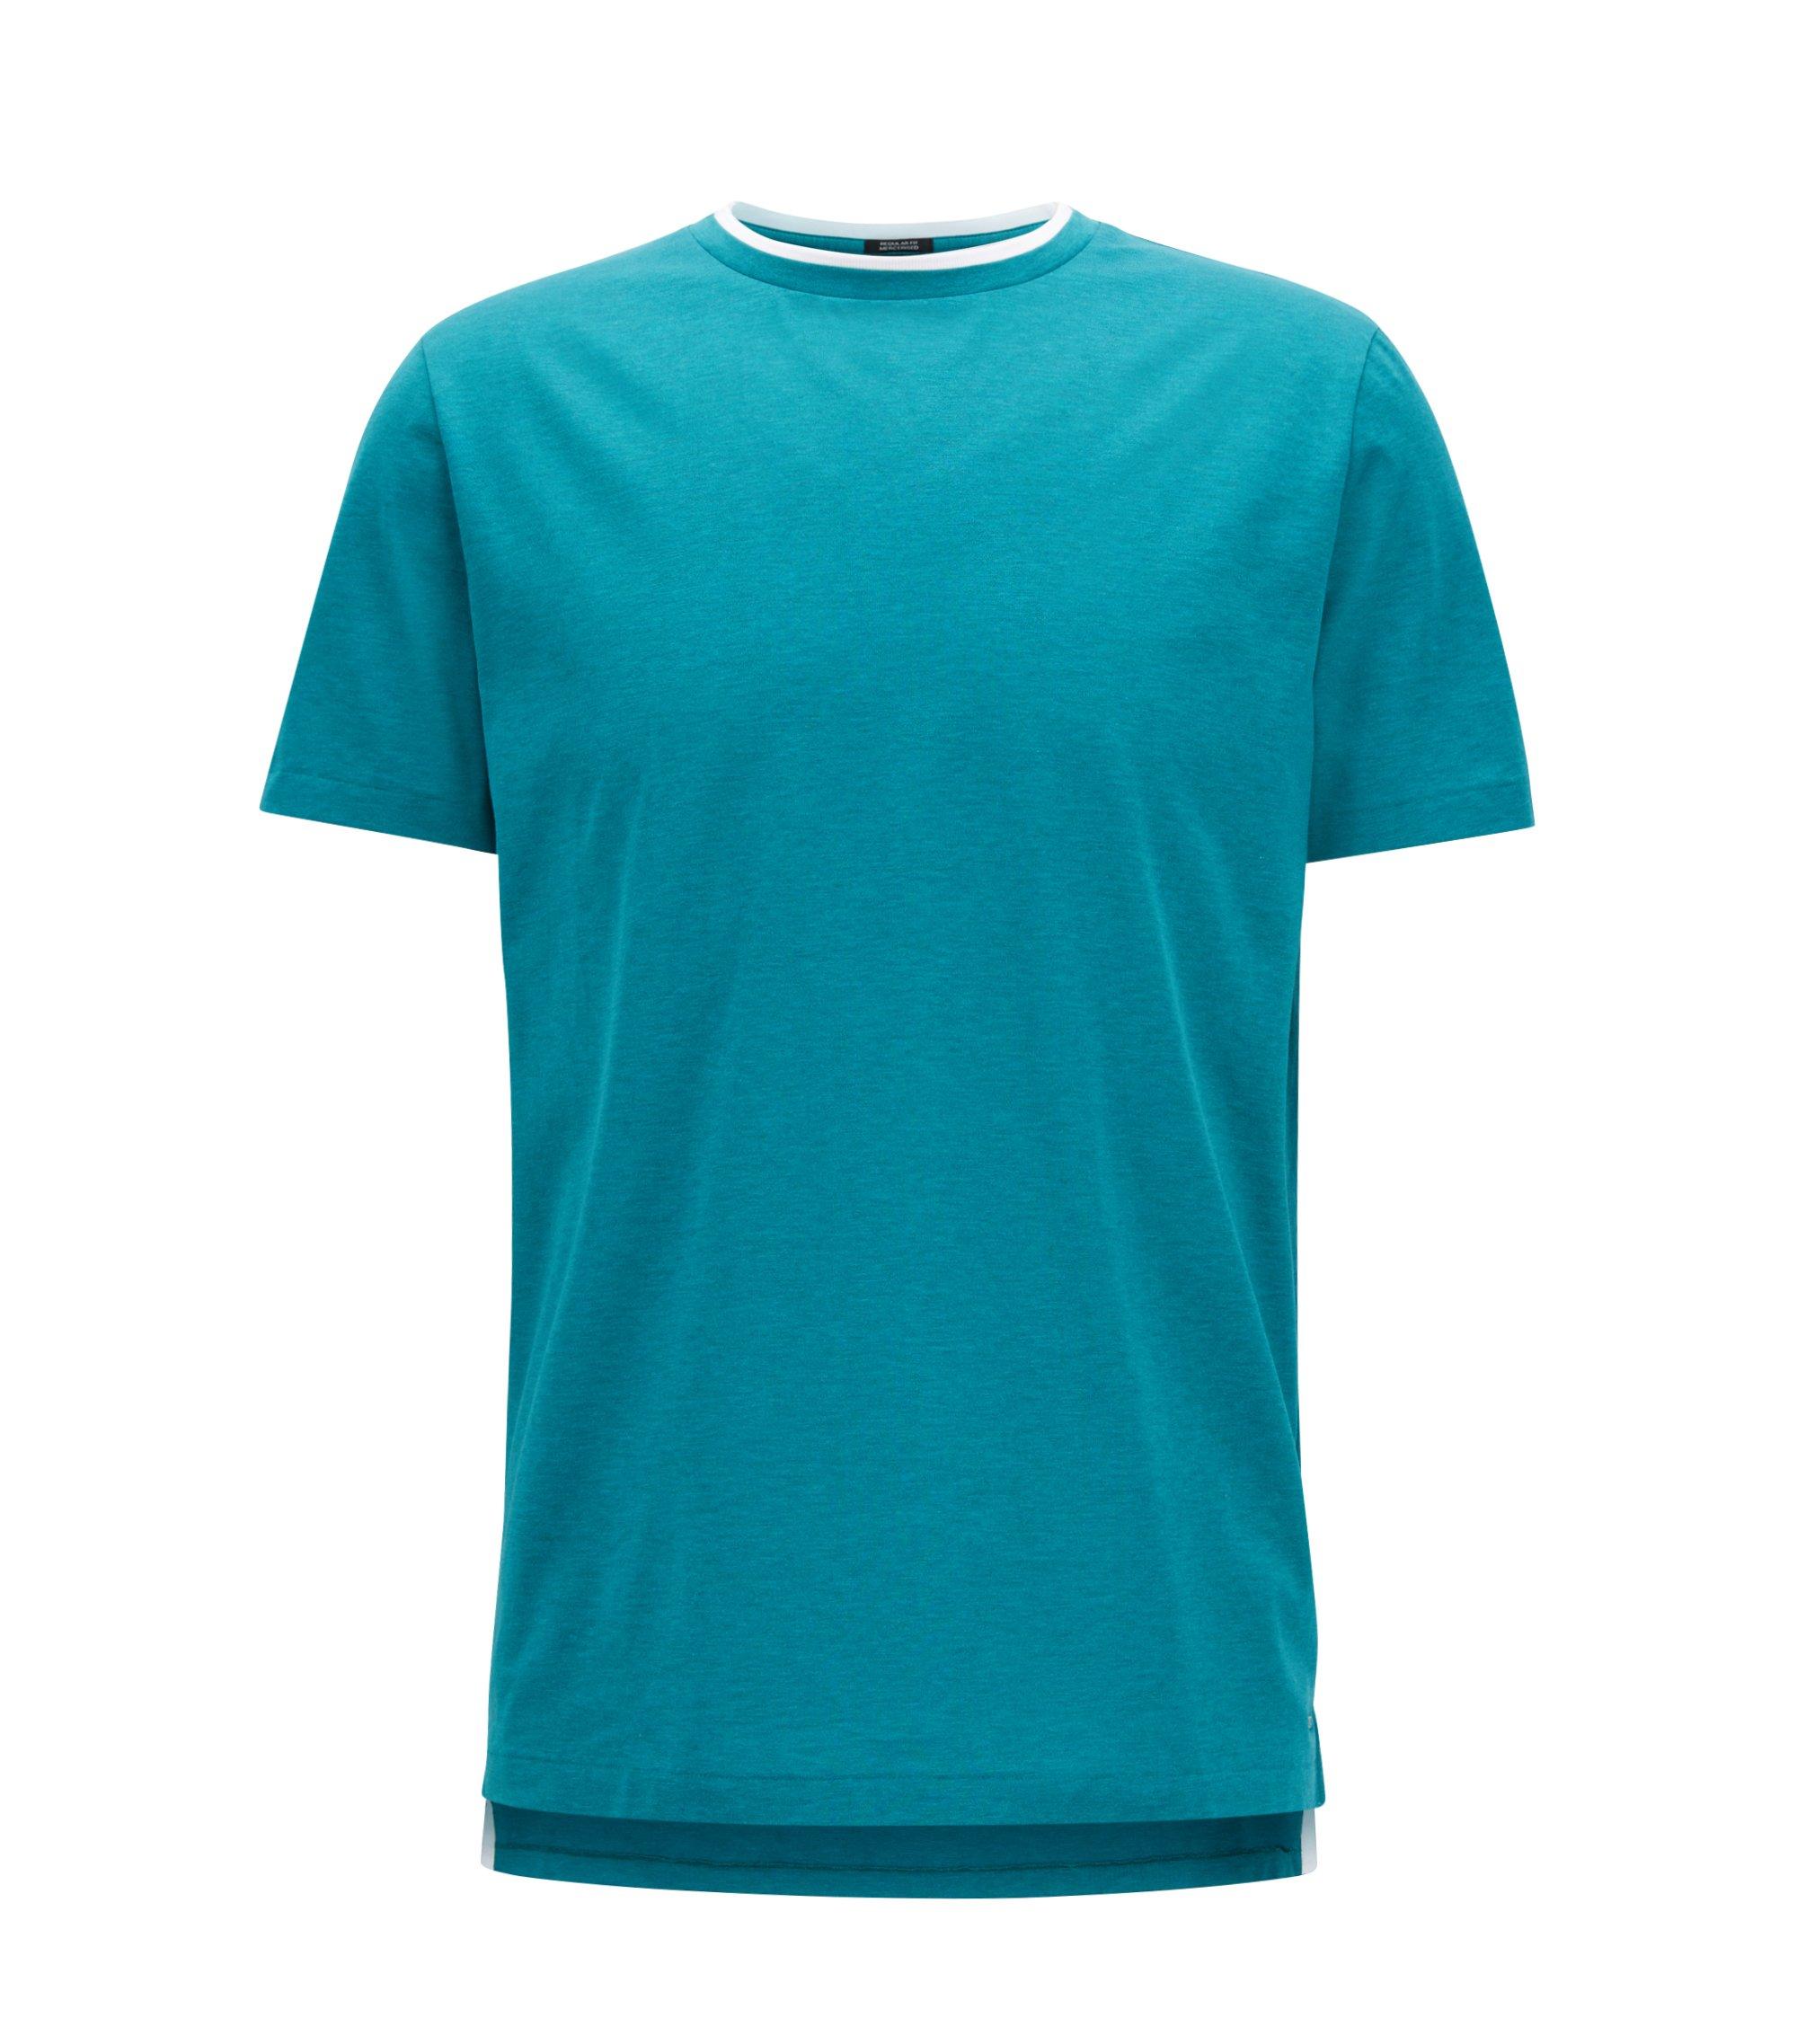 Double-collar T-shirt in mercerized single-jersey cotton, Green